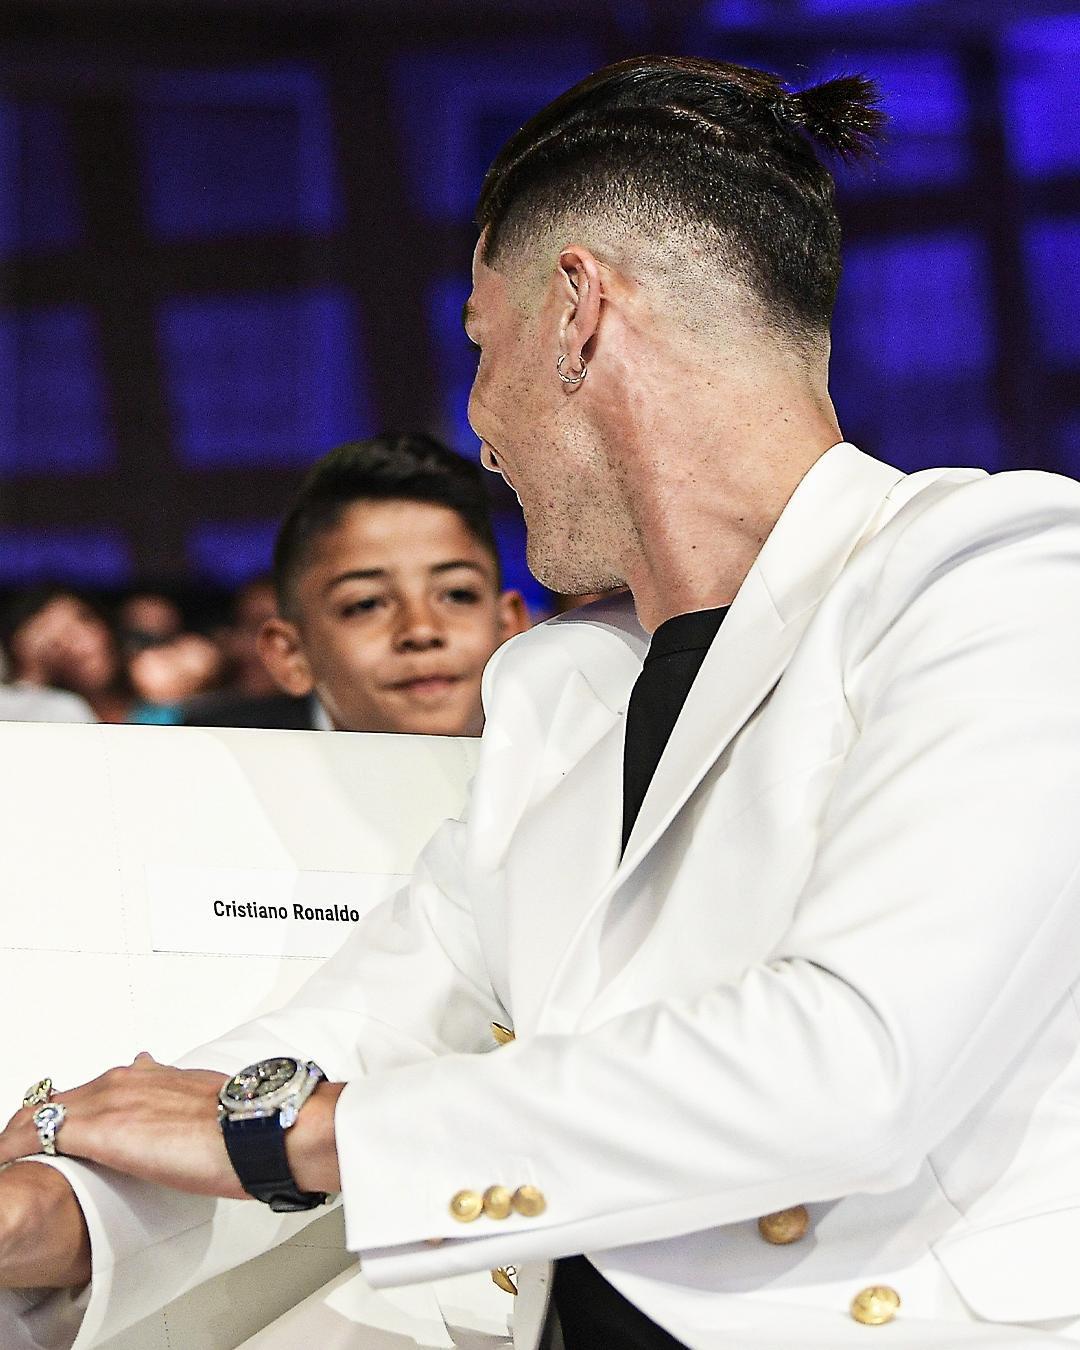 Most Important News Of 2020 So Far Cristiano Ronaldo Rocks A Man